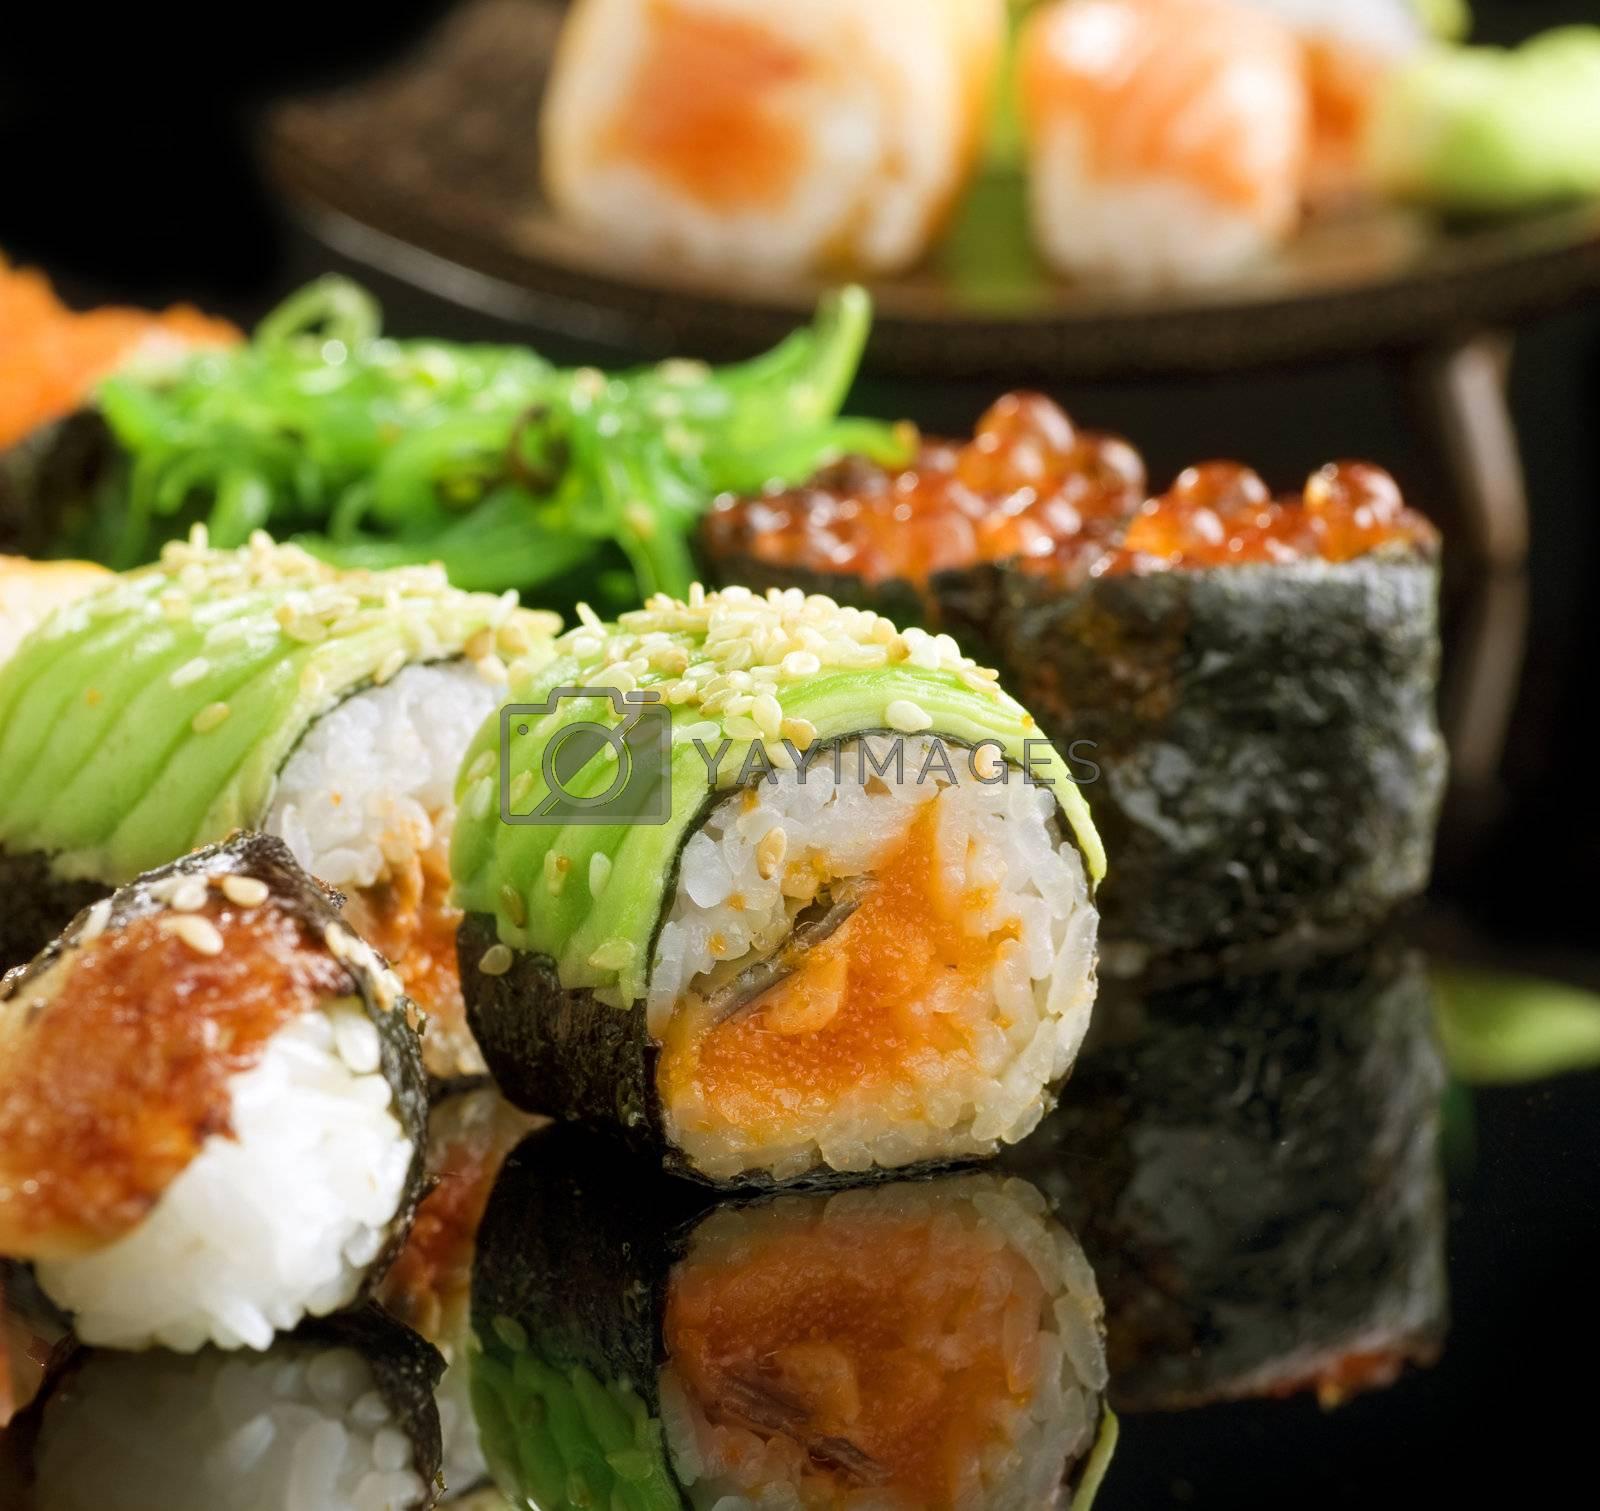 Sushi And Rolls Closeup by Subbotina Anna